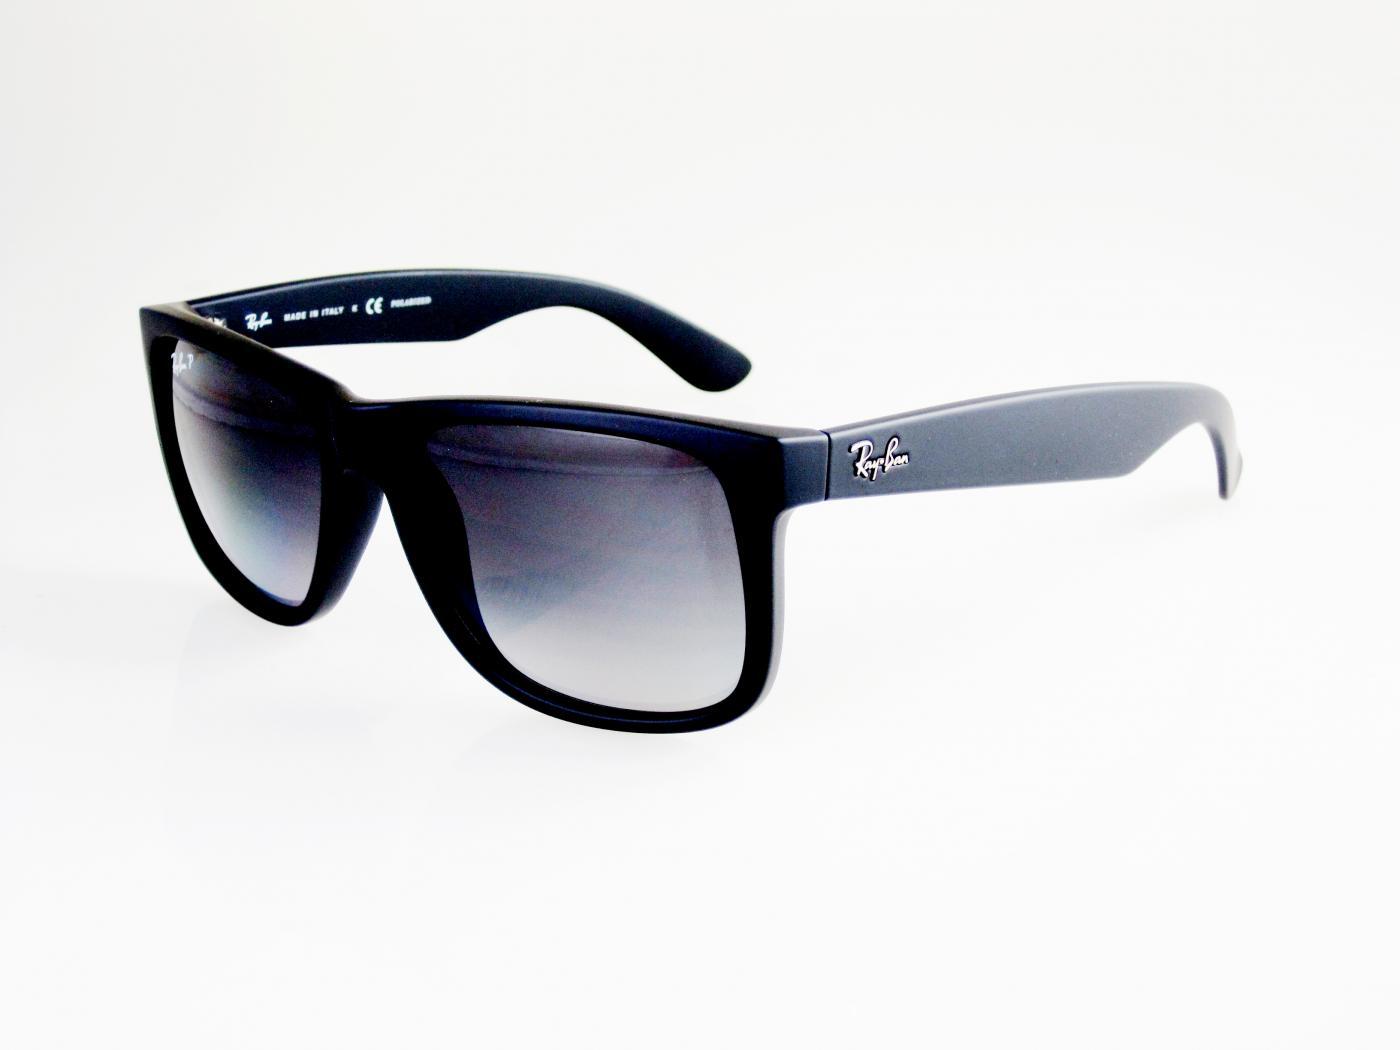 e42036bb8 Unisex slnečné okuliare Ray Ban - Justin | oftalens.sk